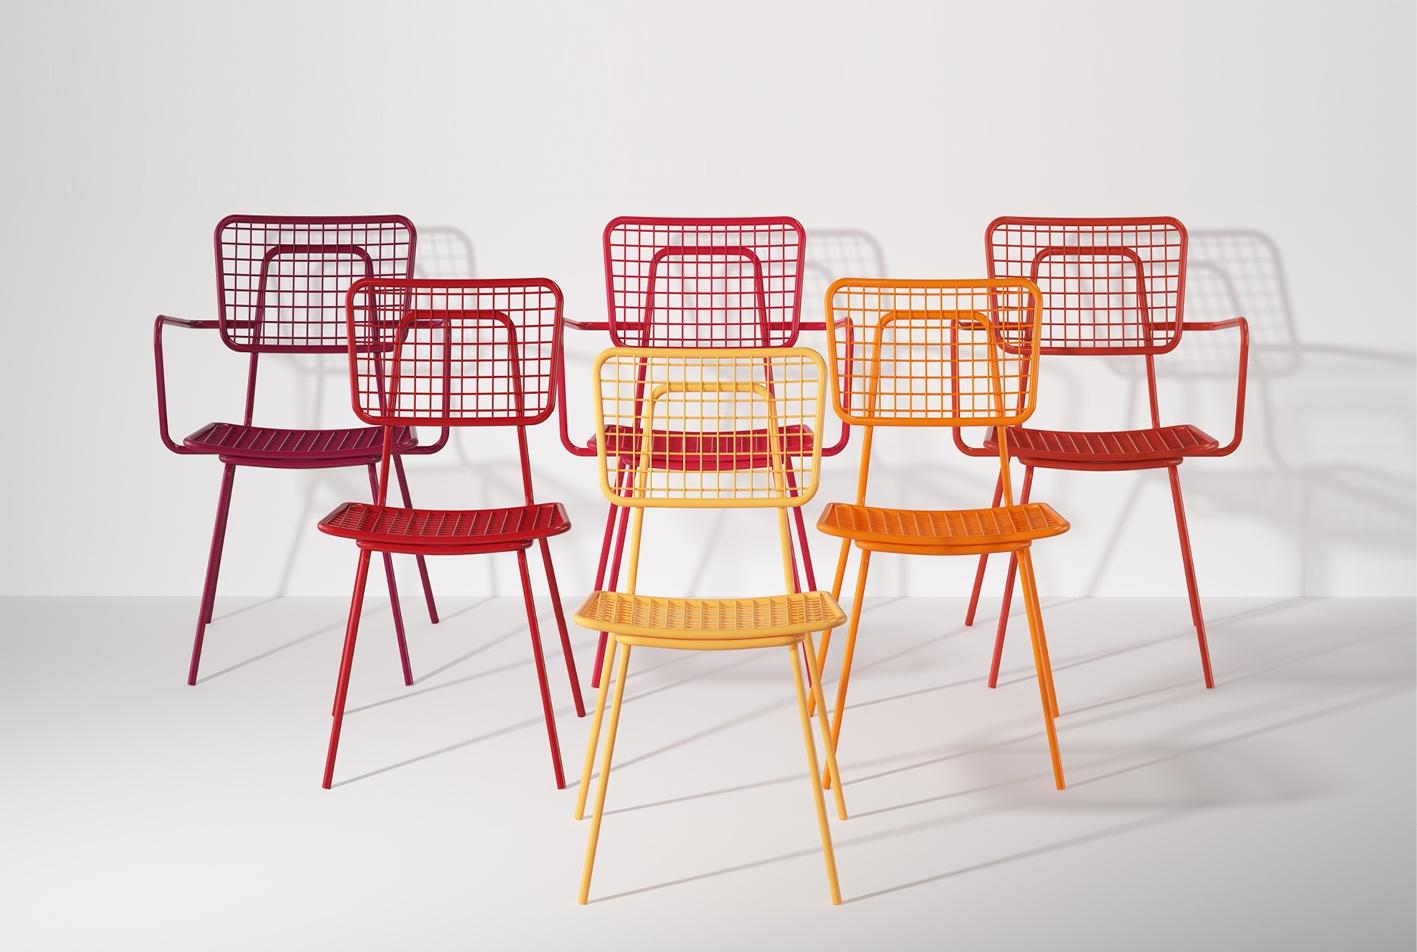 Outdoor Restaurant Chairs.jpg